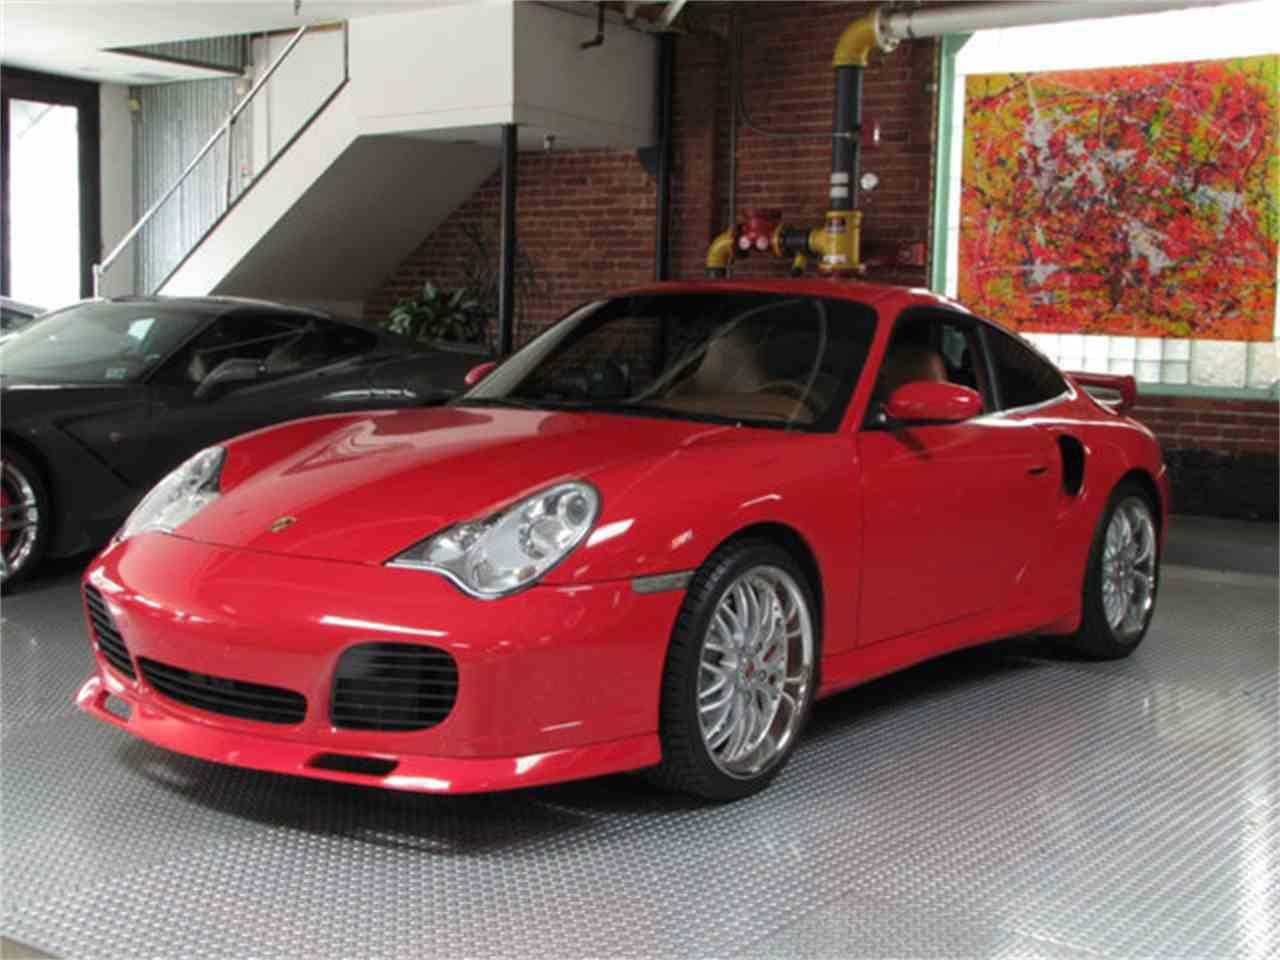 Large Picture of '03 Porsche 911 Carrera located in California - $49,750.00 - LVT6